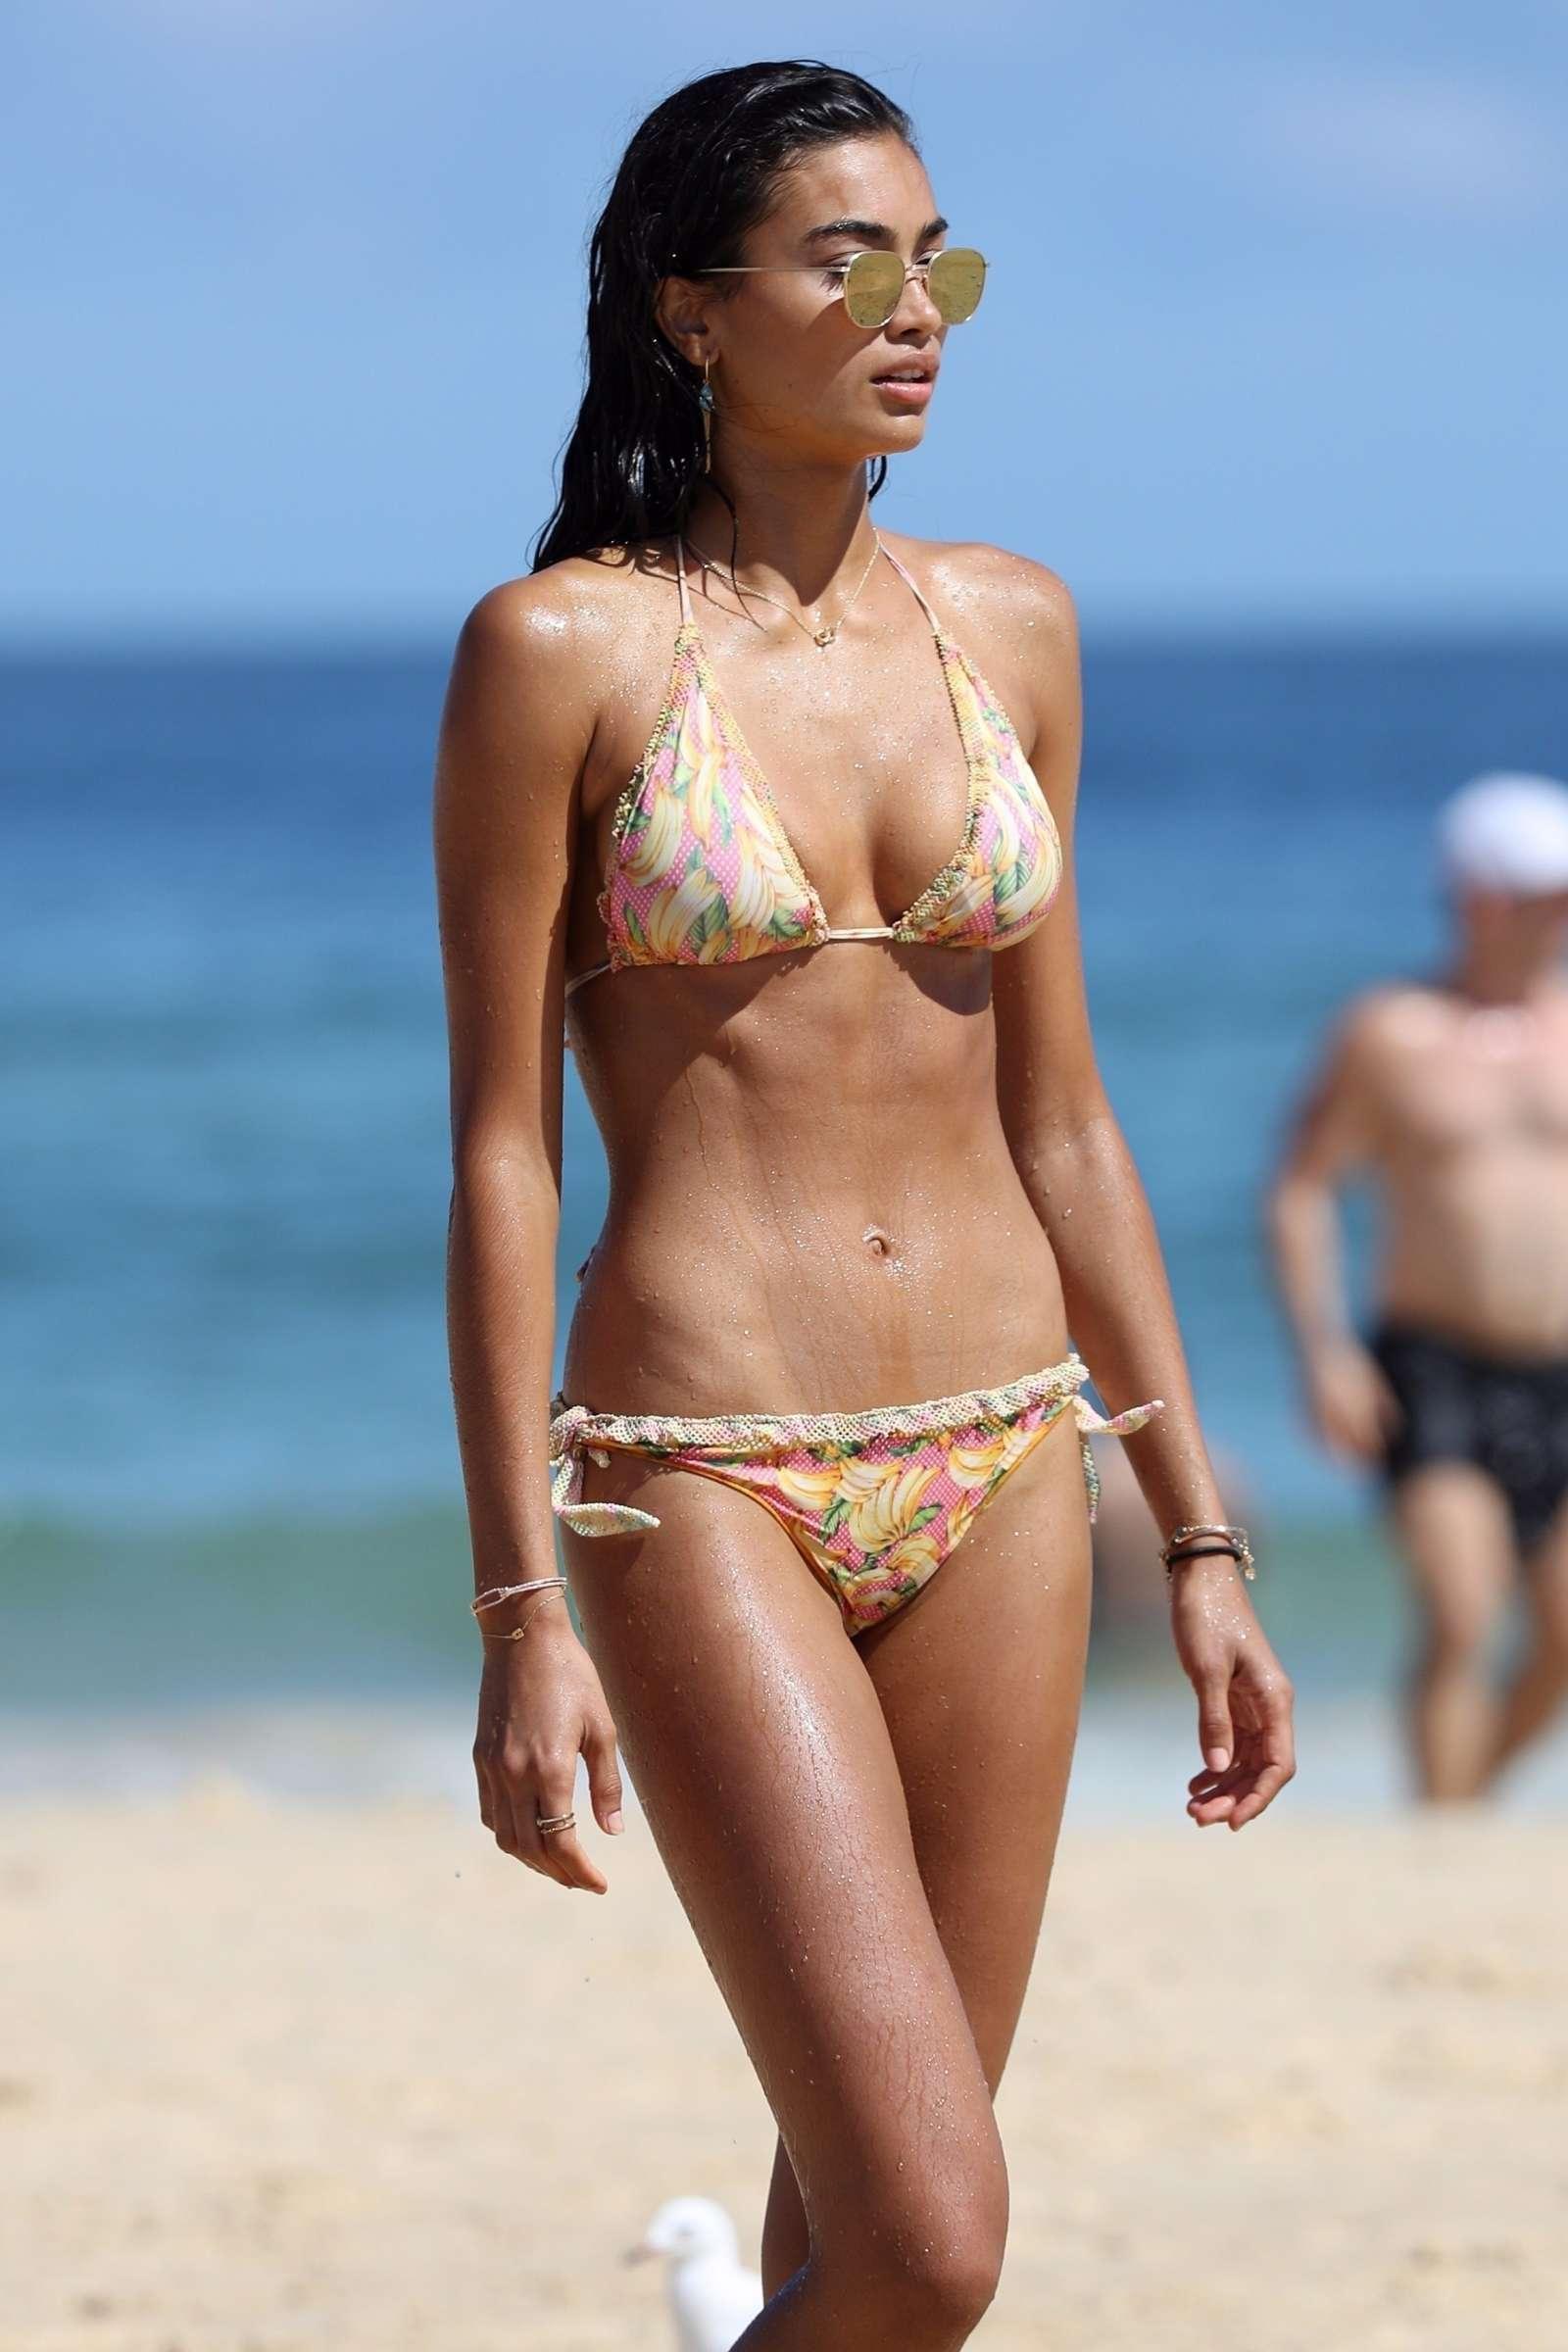 Kelly Gale in Bikini on Bondi Beach in Sydney Pic 15 of 35